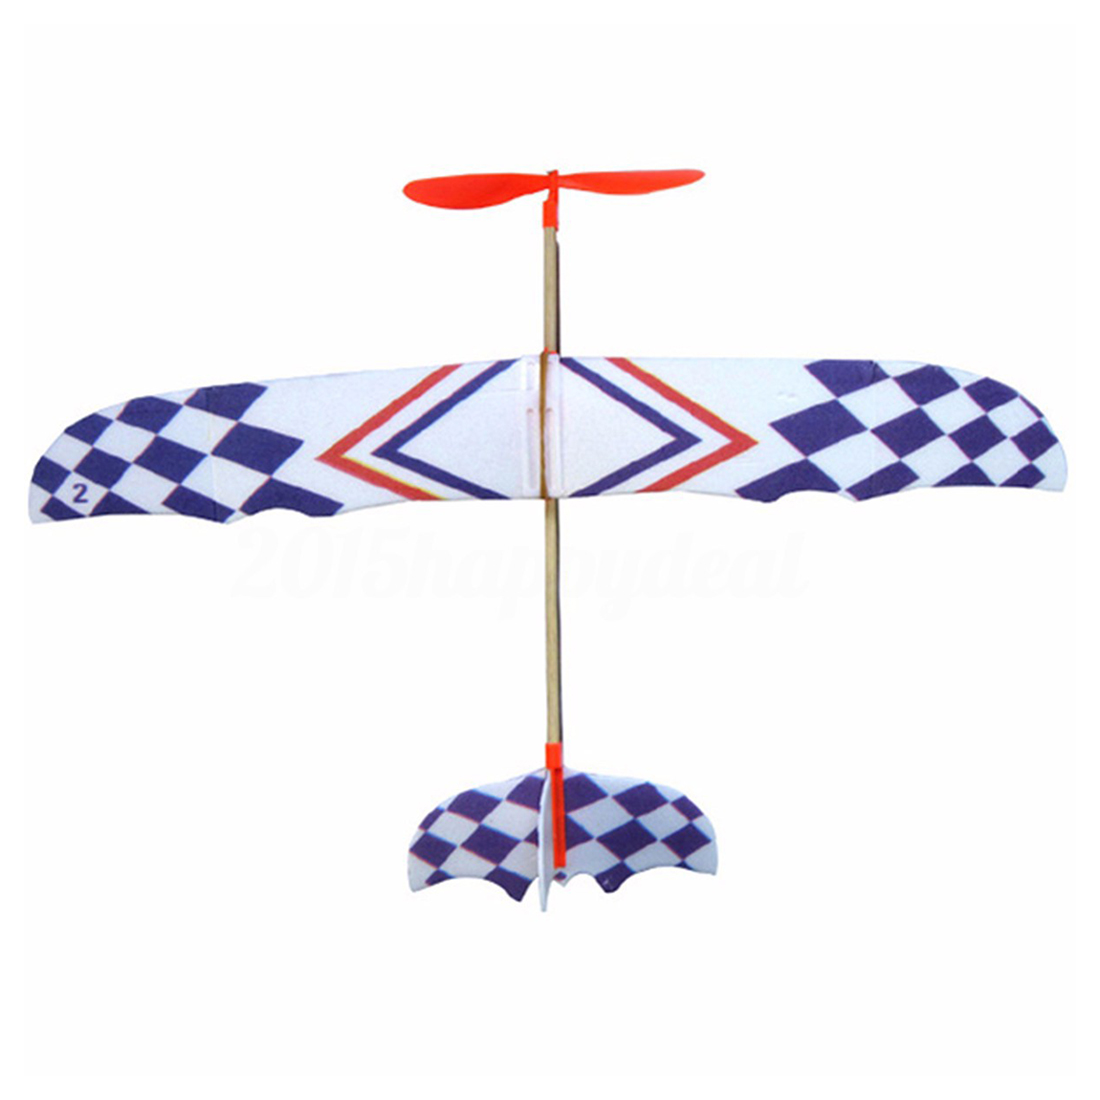 Elastic Rubber Band Powered DIY Foam Plane Model Kit Aircraft Educational Toy